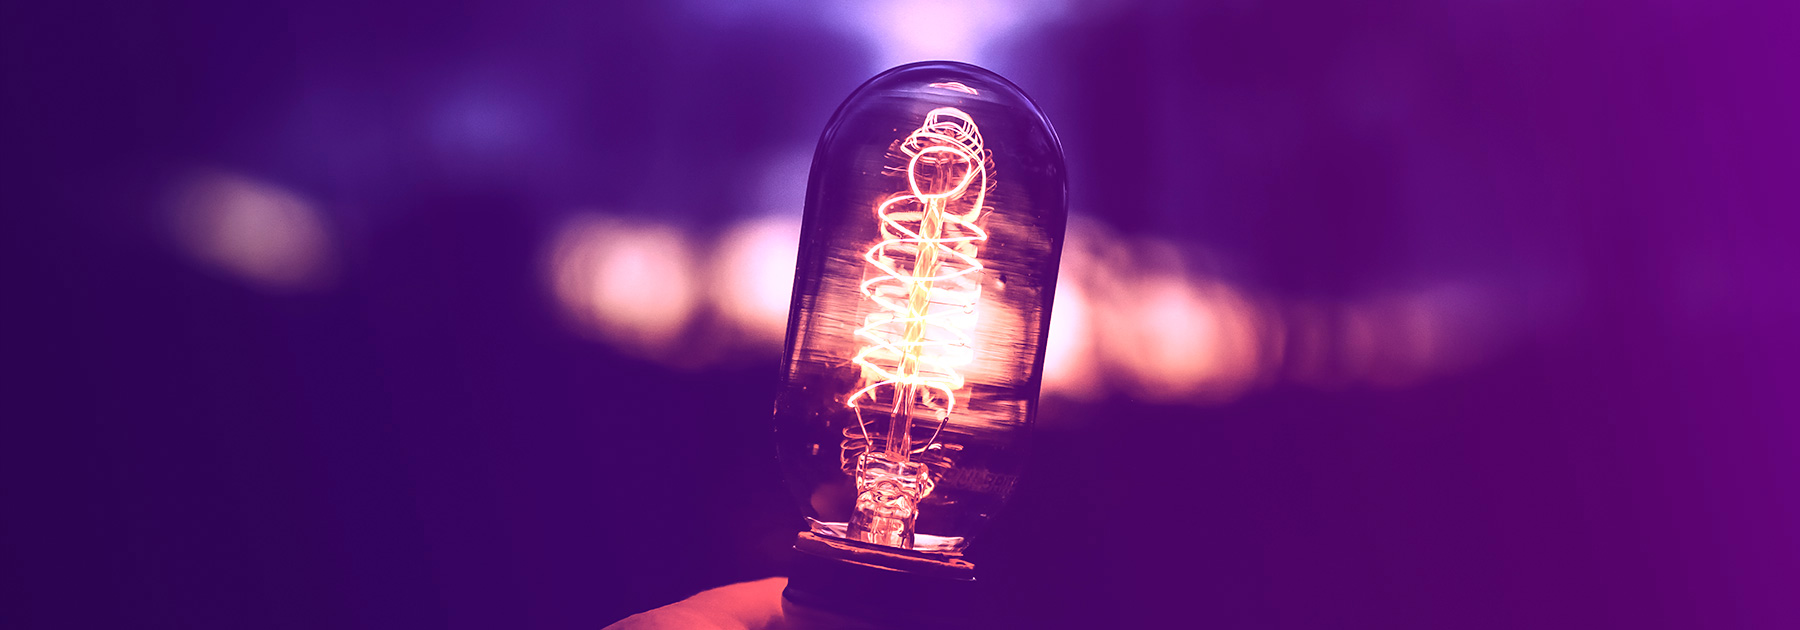 powering business stories por FG-teste